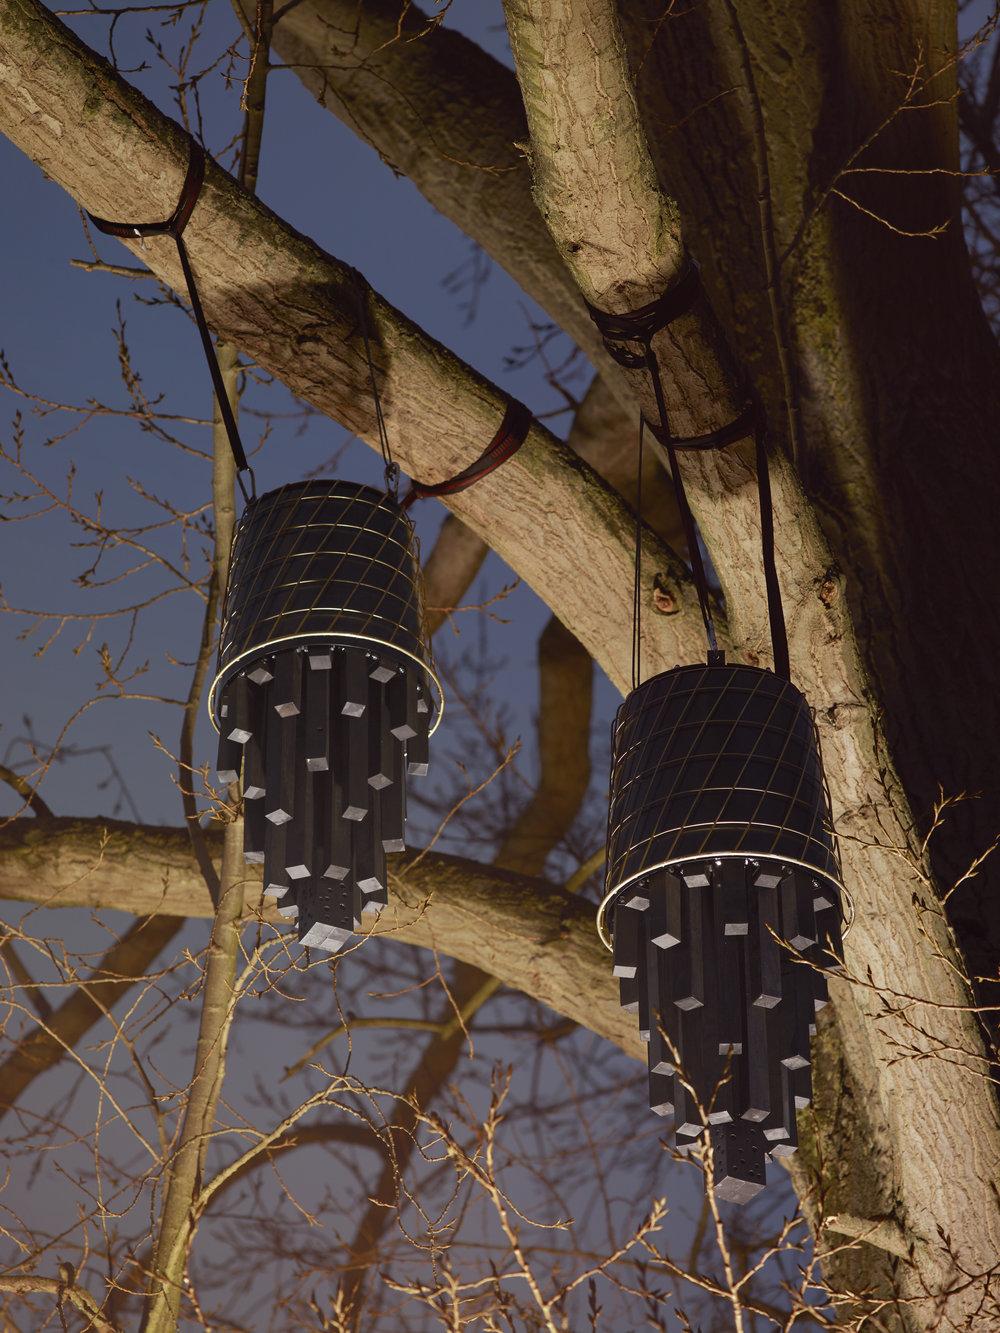 Fladdermösshus by Studio Weave's Je Ahn